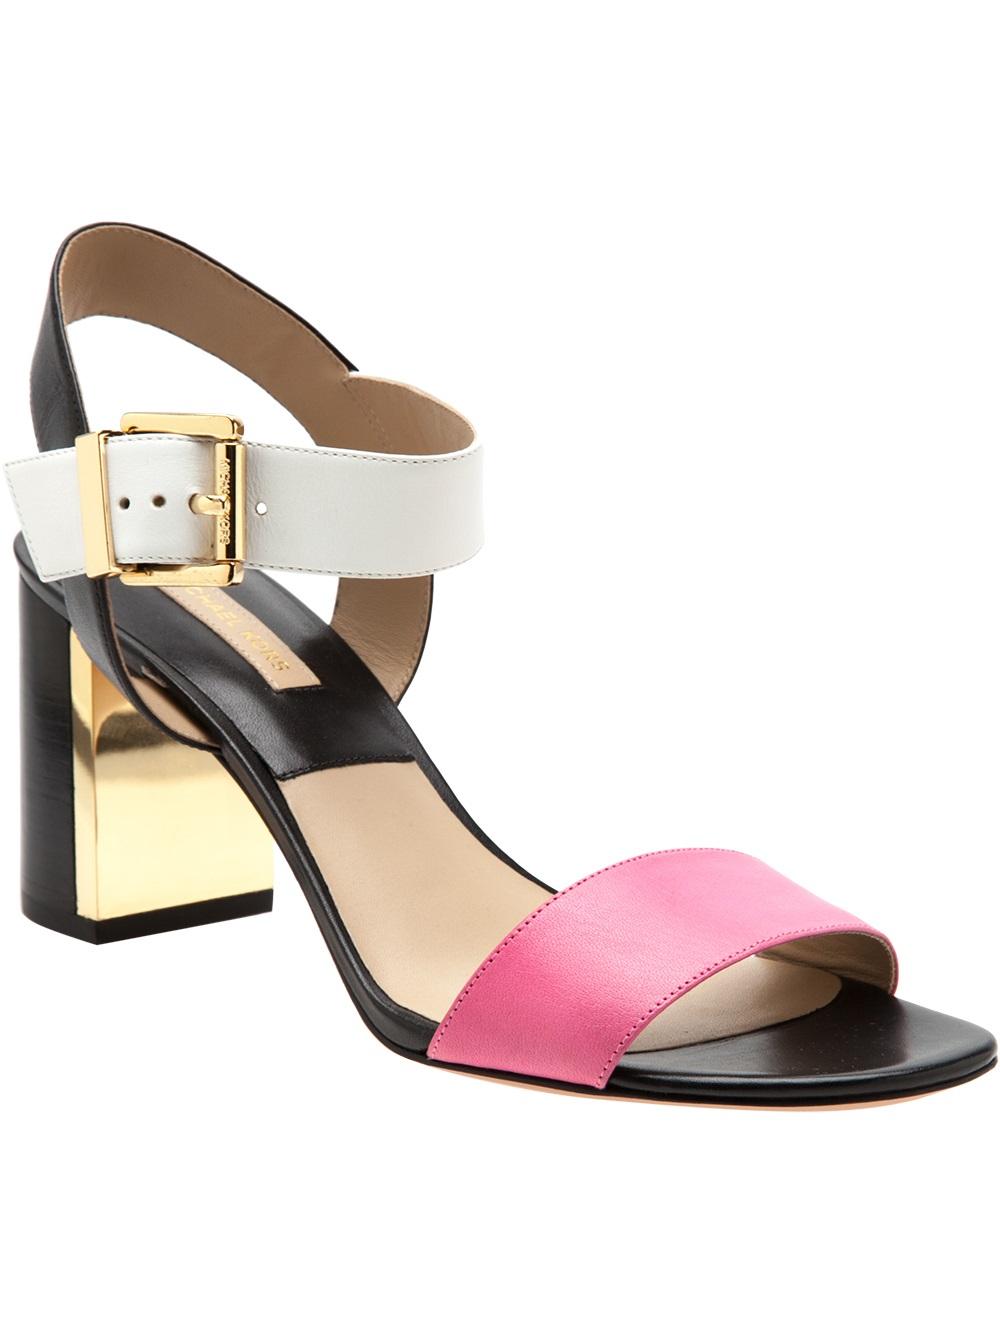 Michael Kors Chunky Heel Sandal In Pink Pink Amp Purple Lyst